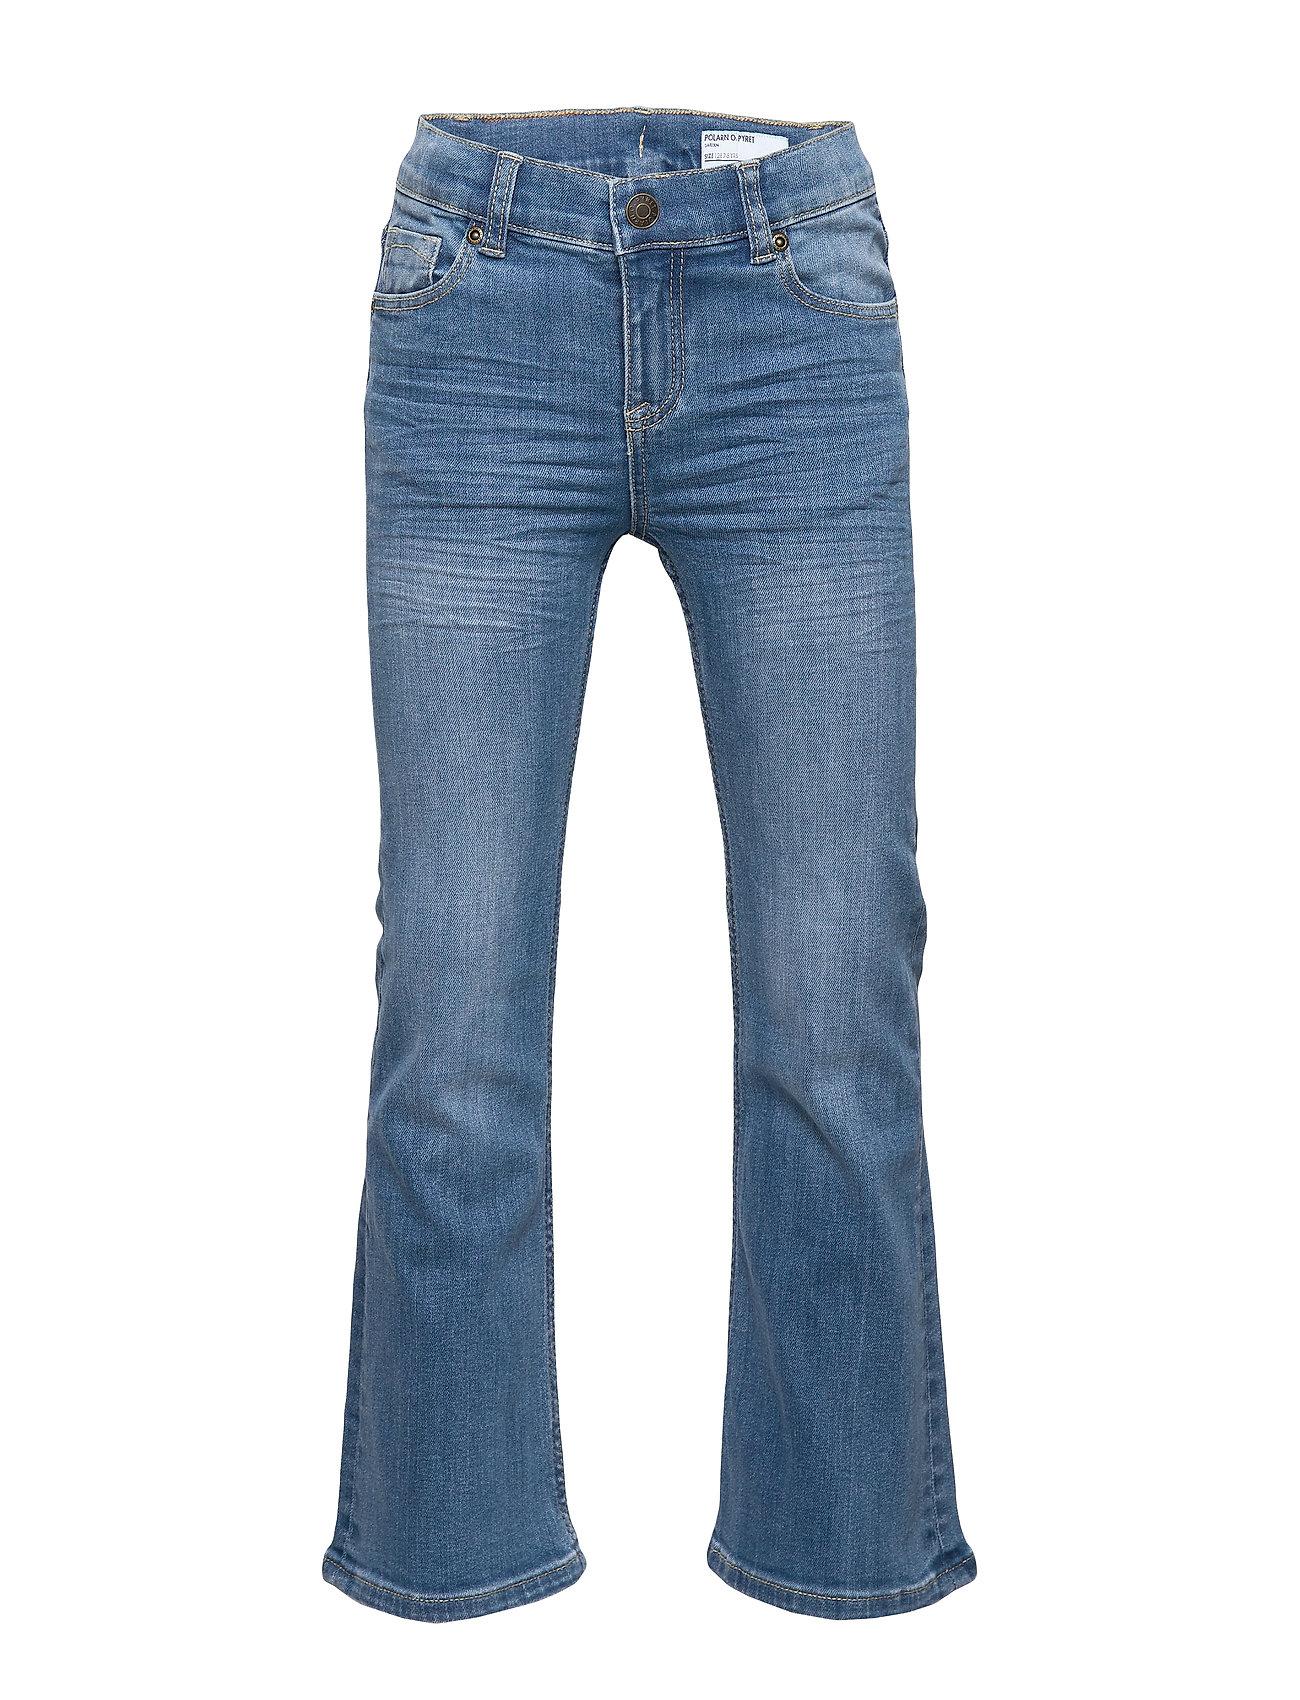 Polarn O. Pyret Jeans Flare School - LIGHT DENIM